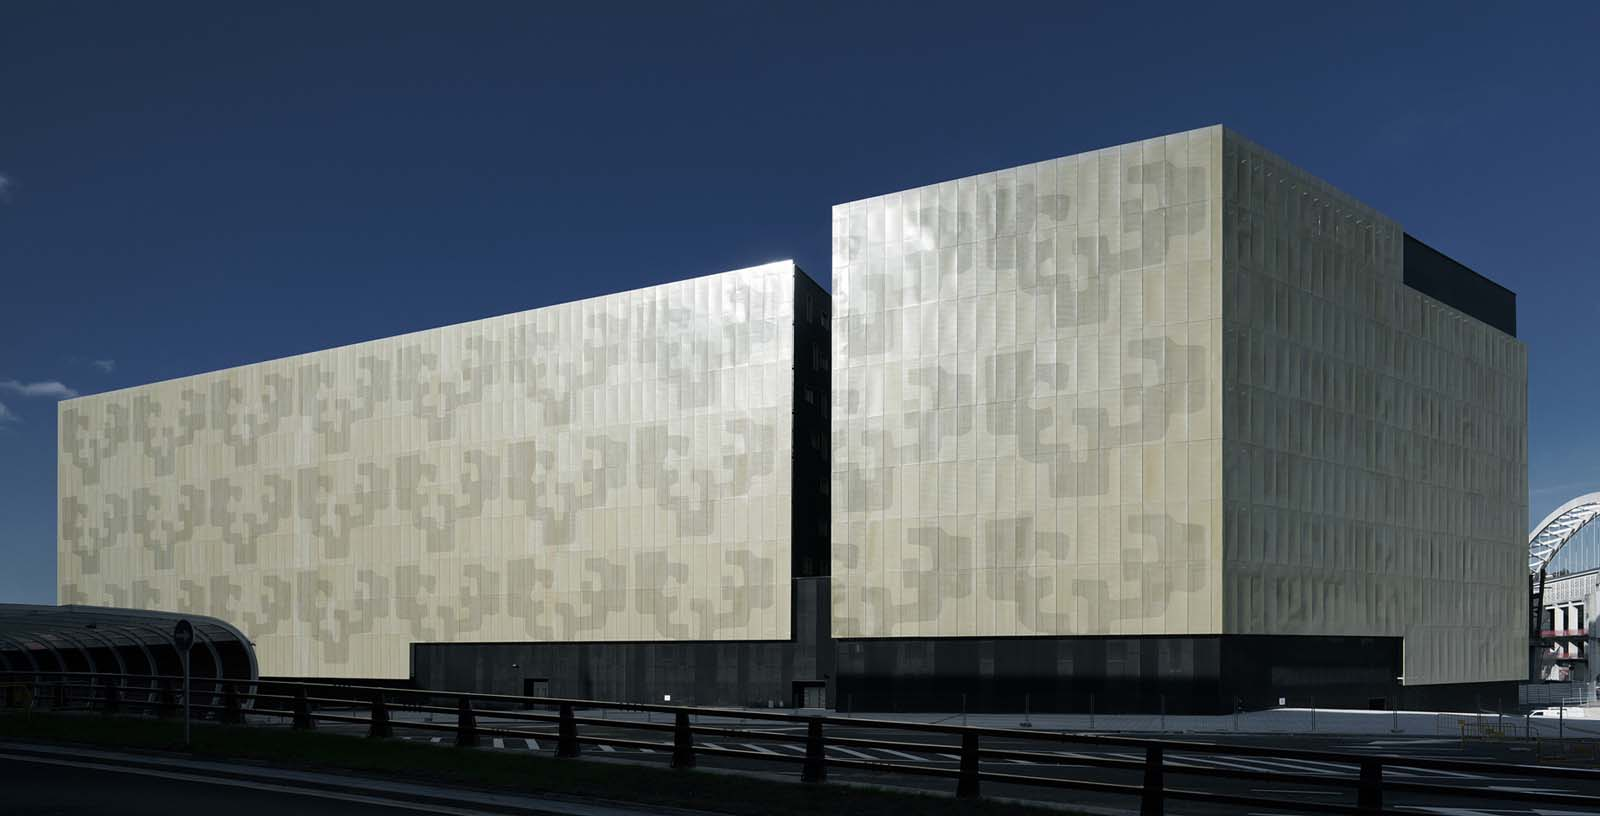 Engineerings_Schools_Building_Bilbao_01_Architecture_IDOM_photos_Aitor_Ortiz